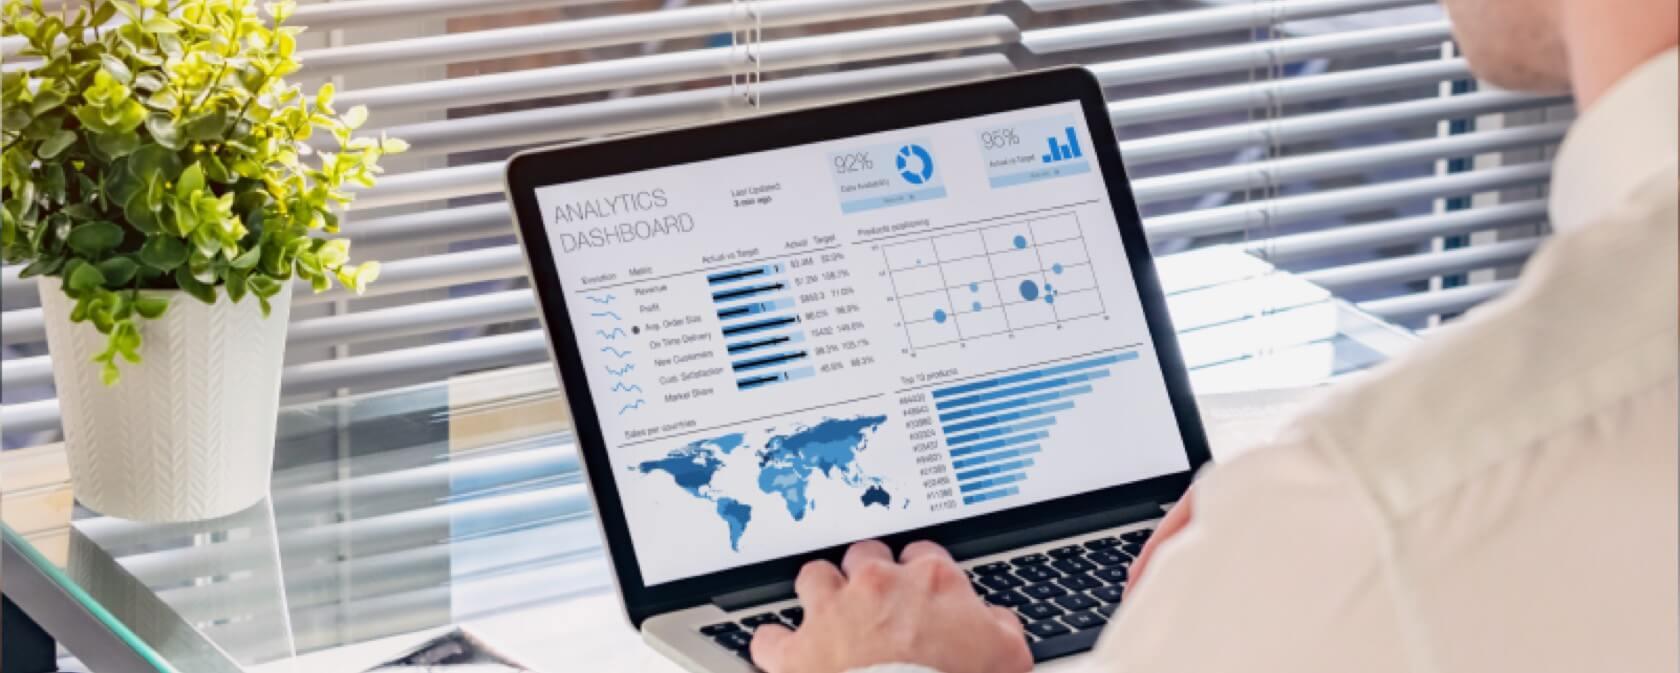 Enterprise management dashboard pc